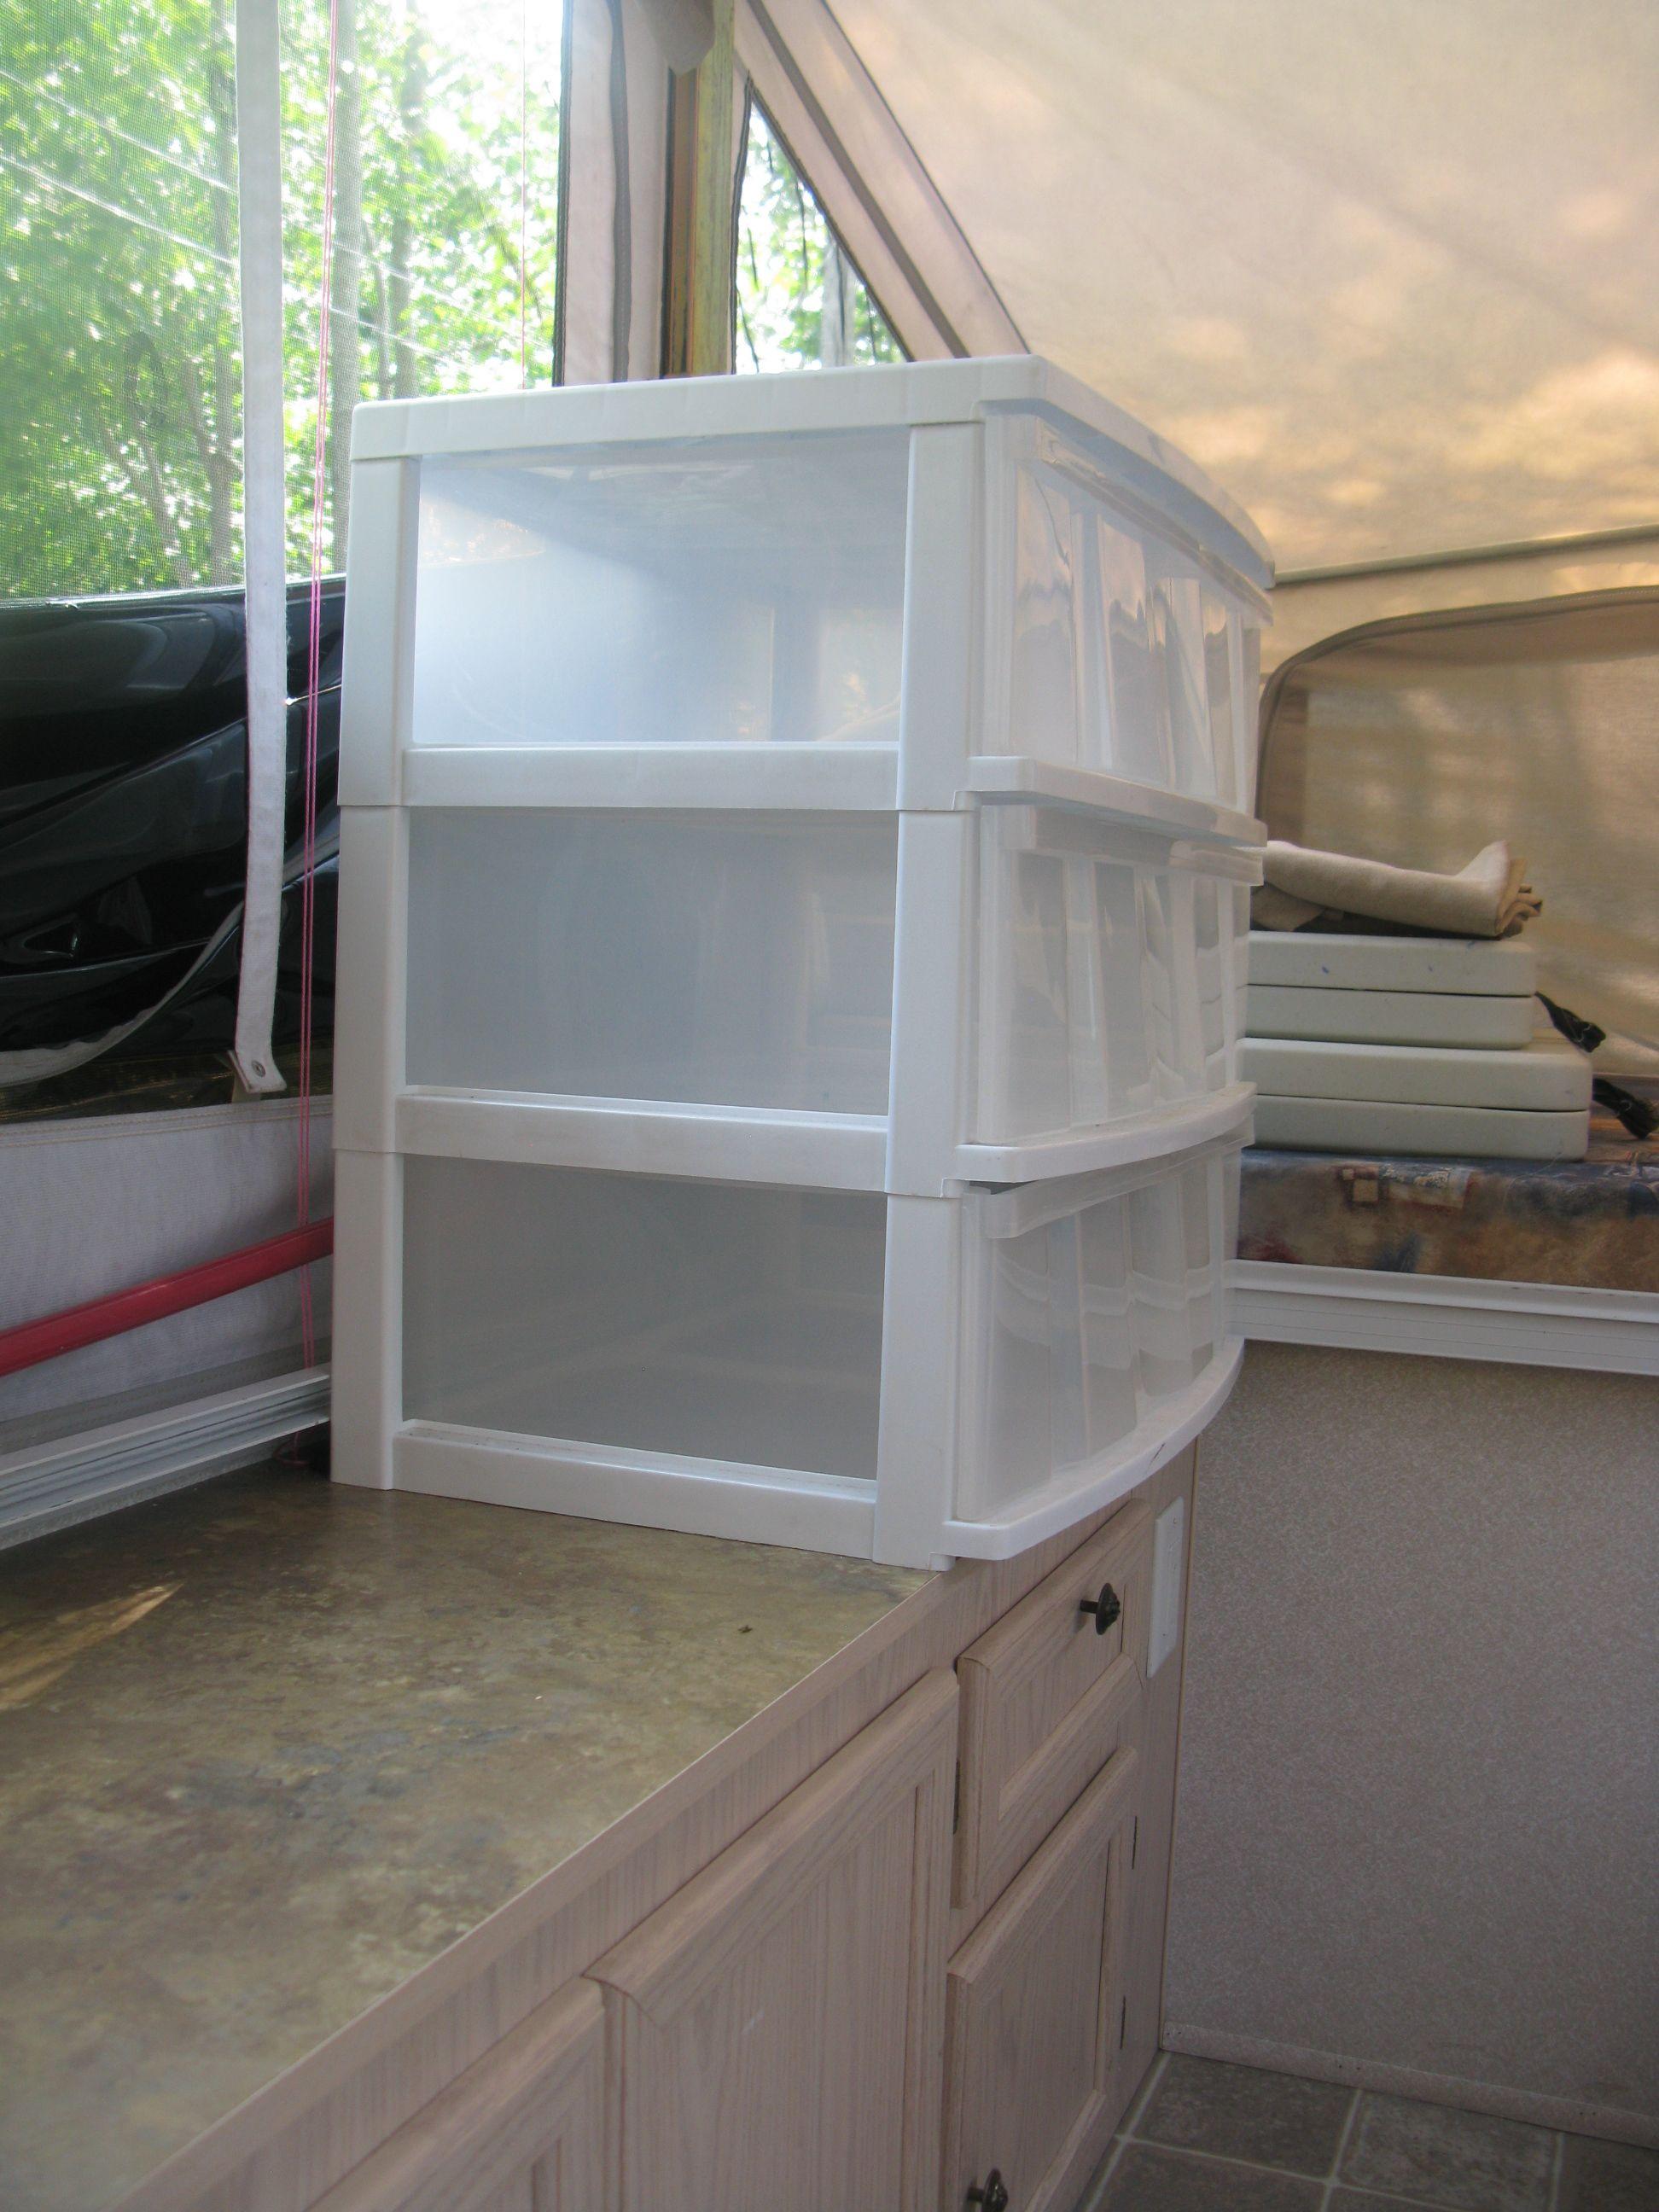 clothing storage box for tent trailer bo te de rangement. Black Bedroom Furniture Sets. Home Design Ideas